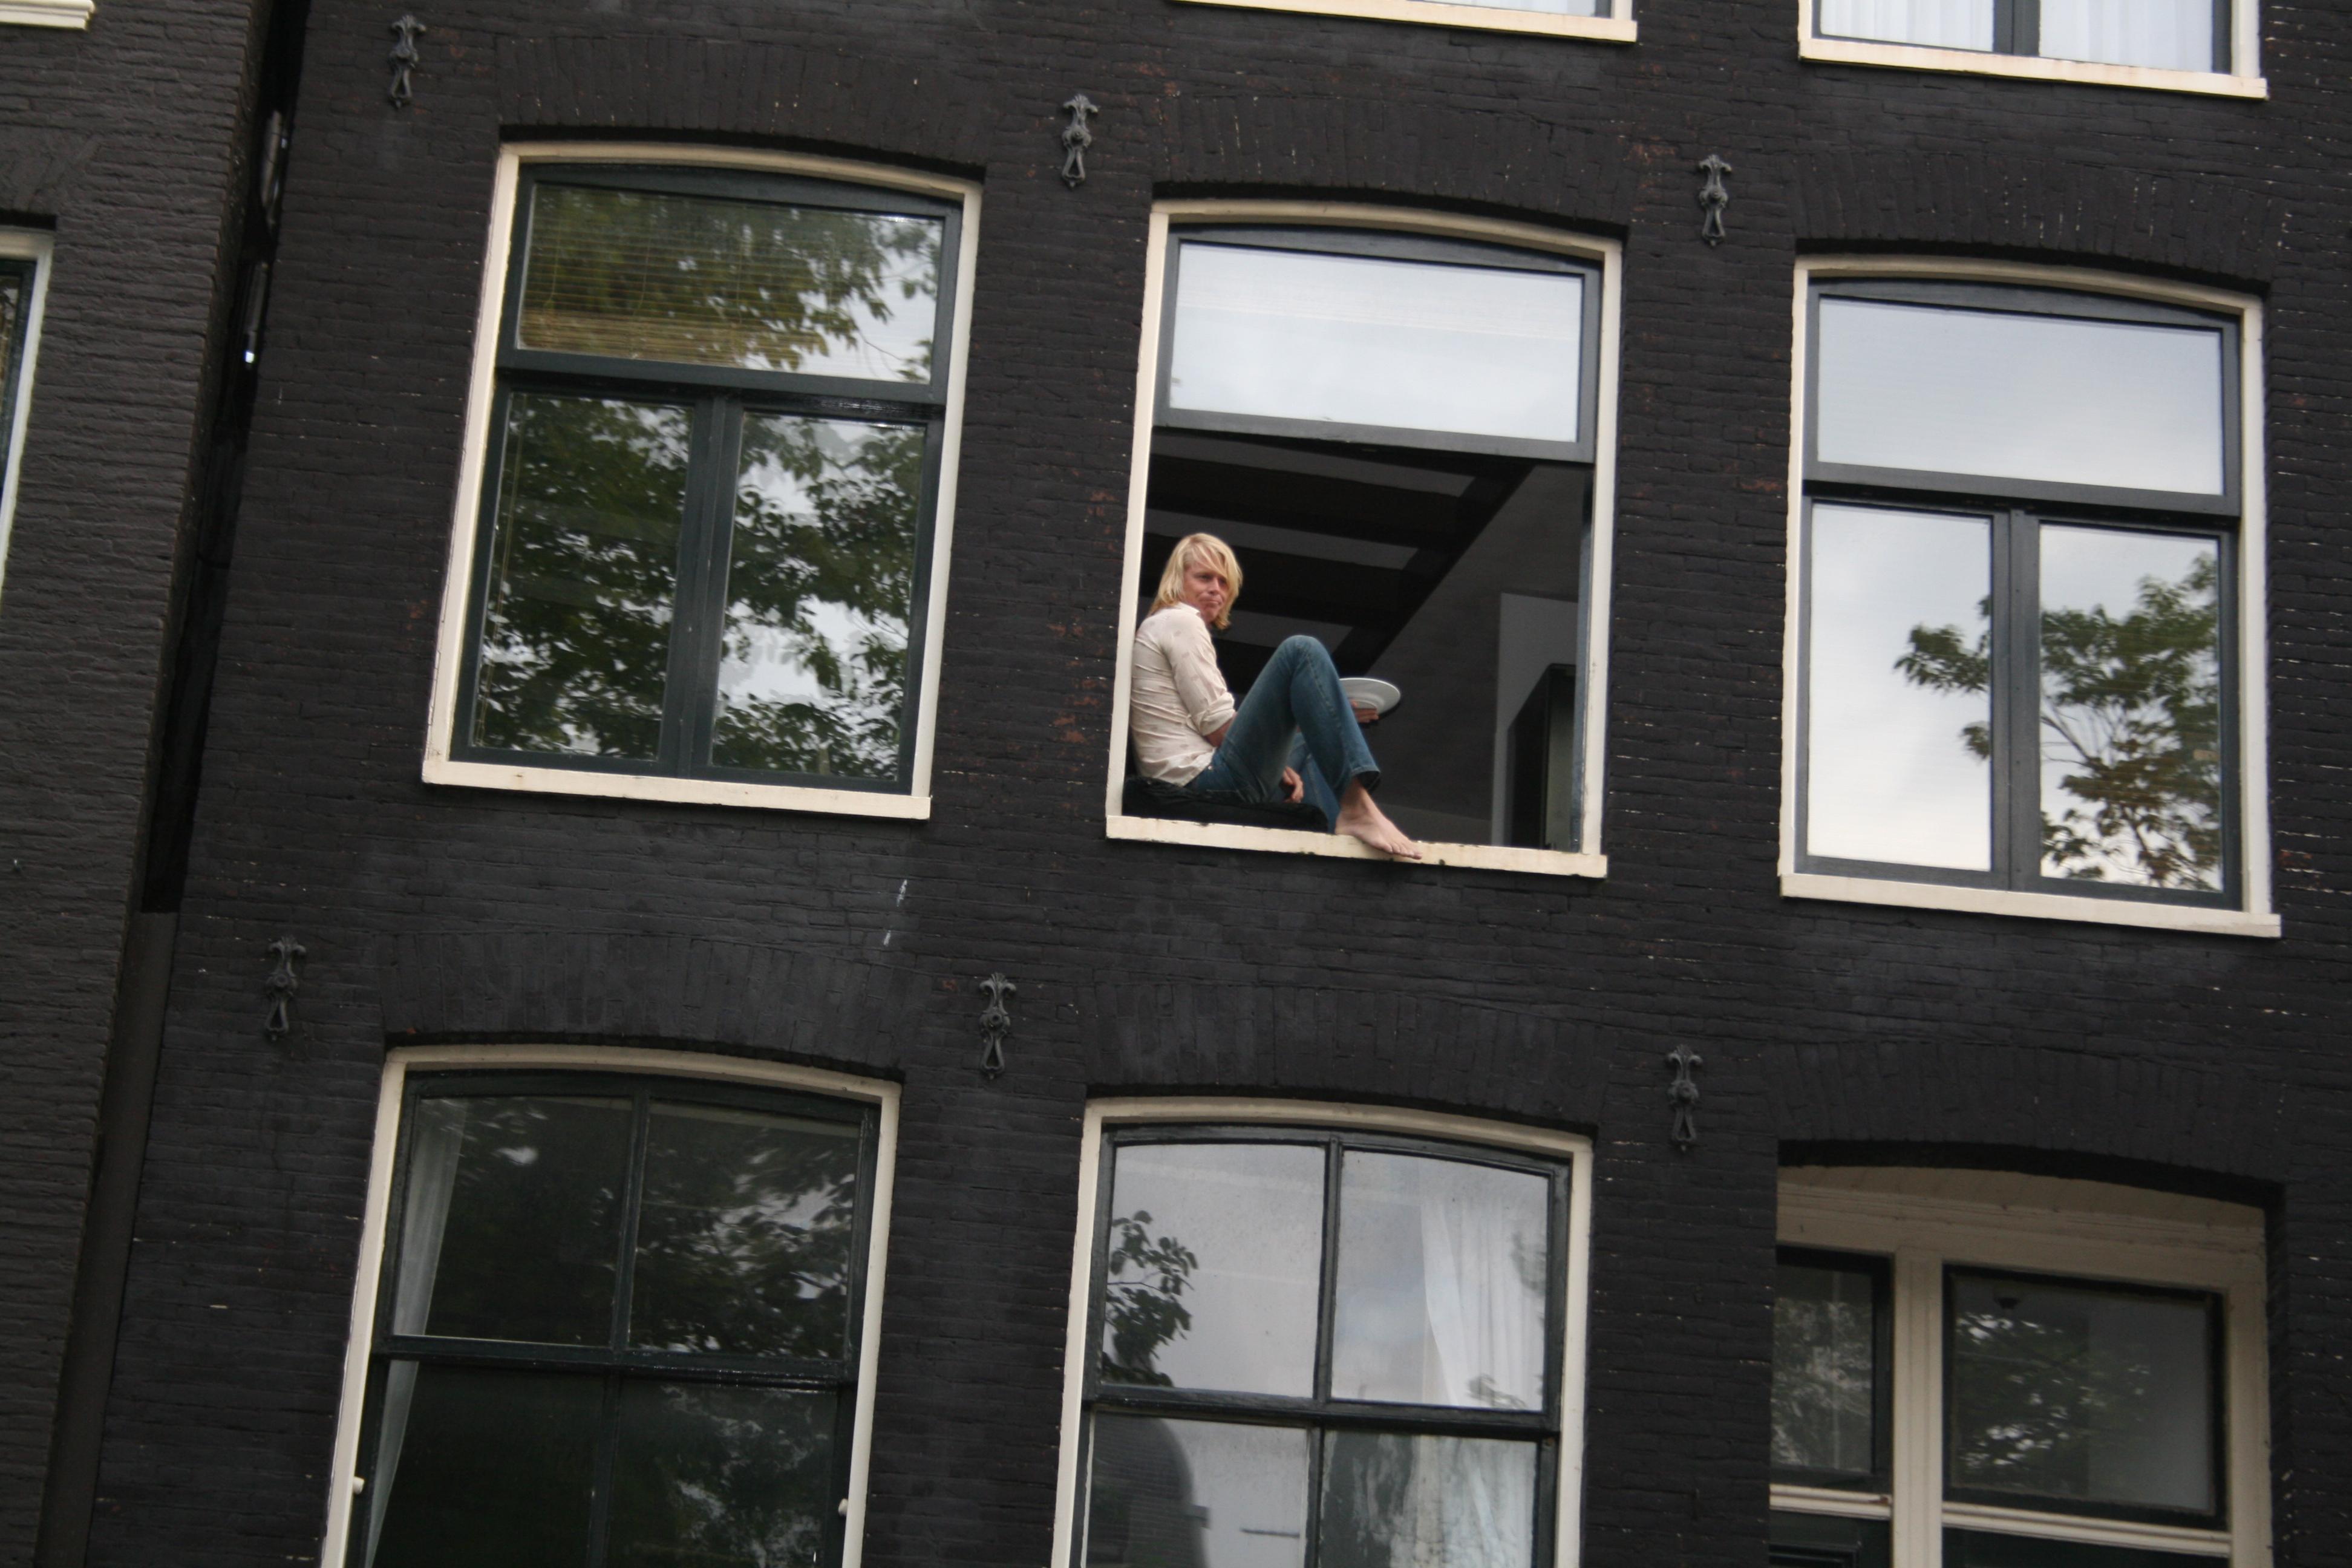 Amsterdam Girl at Window